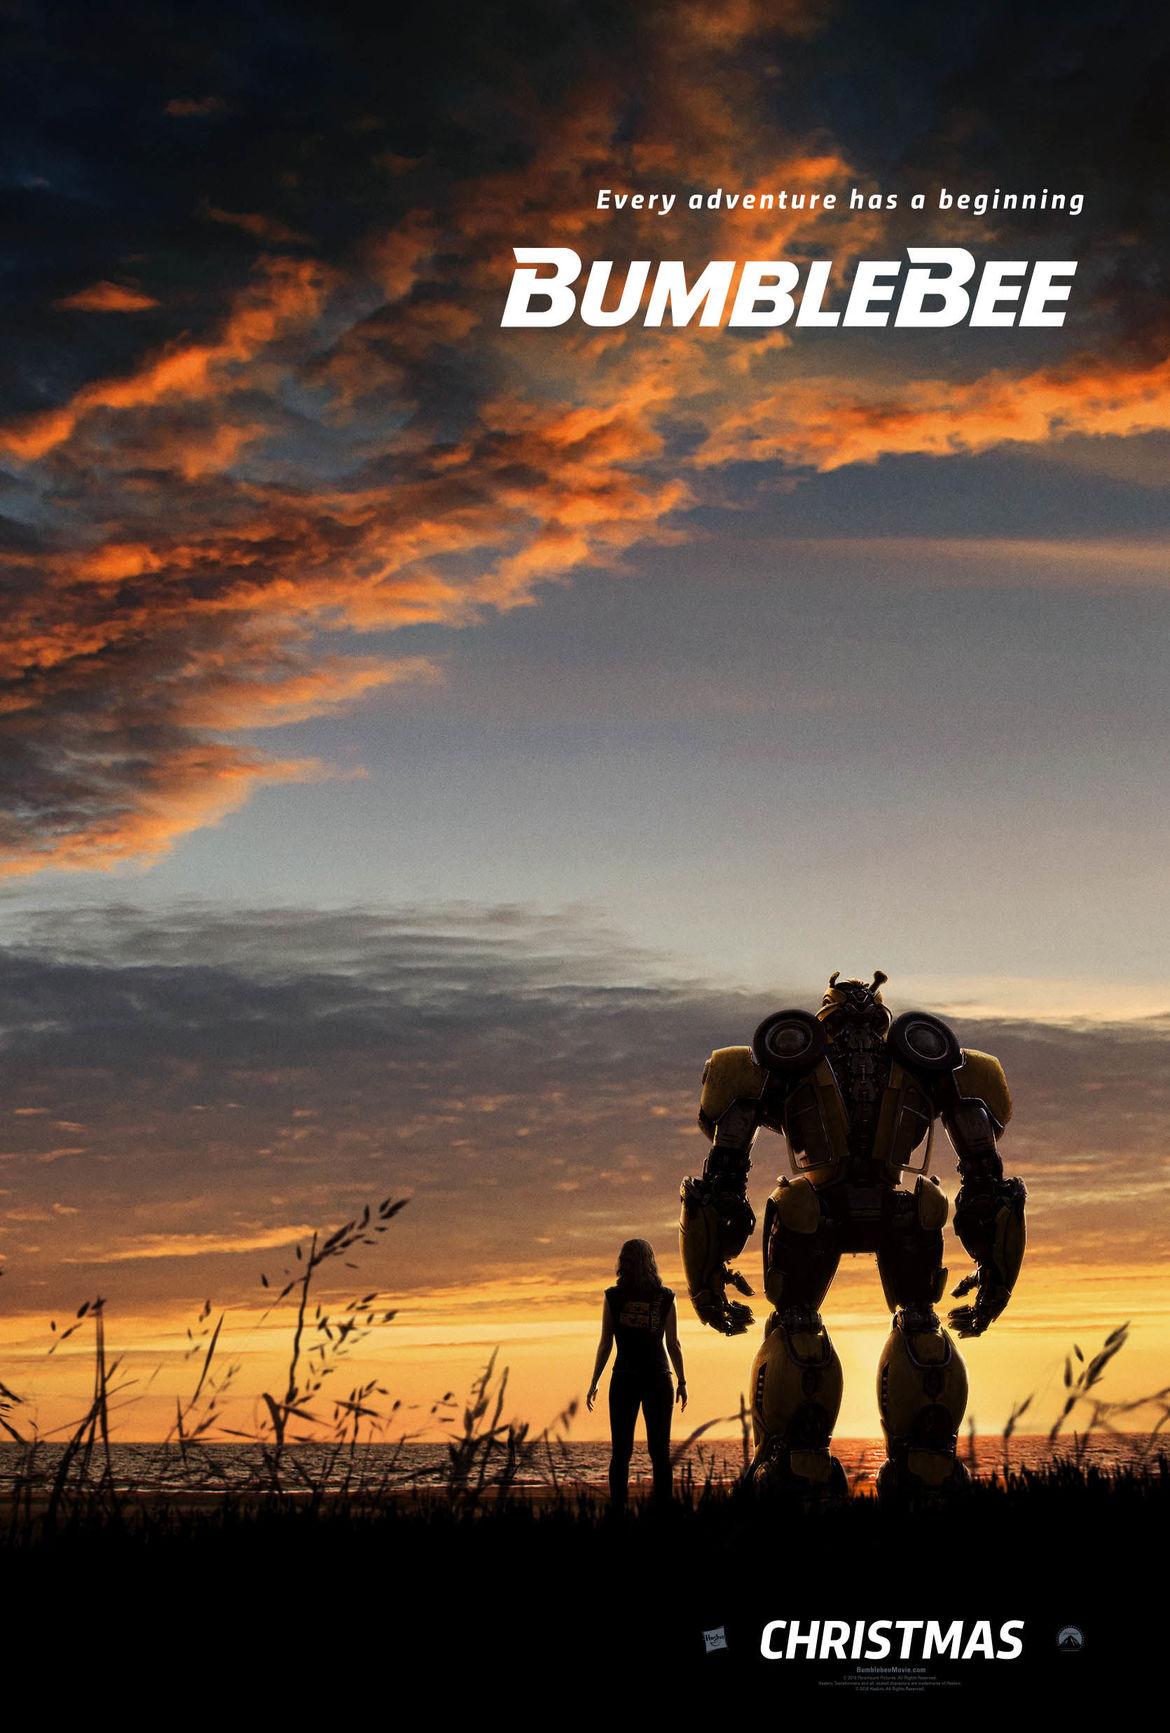 bumblebee-BB_Online_Dom_Vertical_Teaser_Sunset_rgb